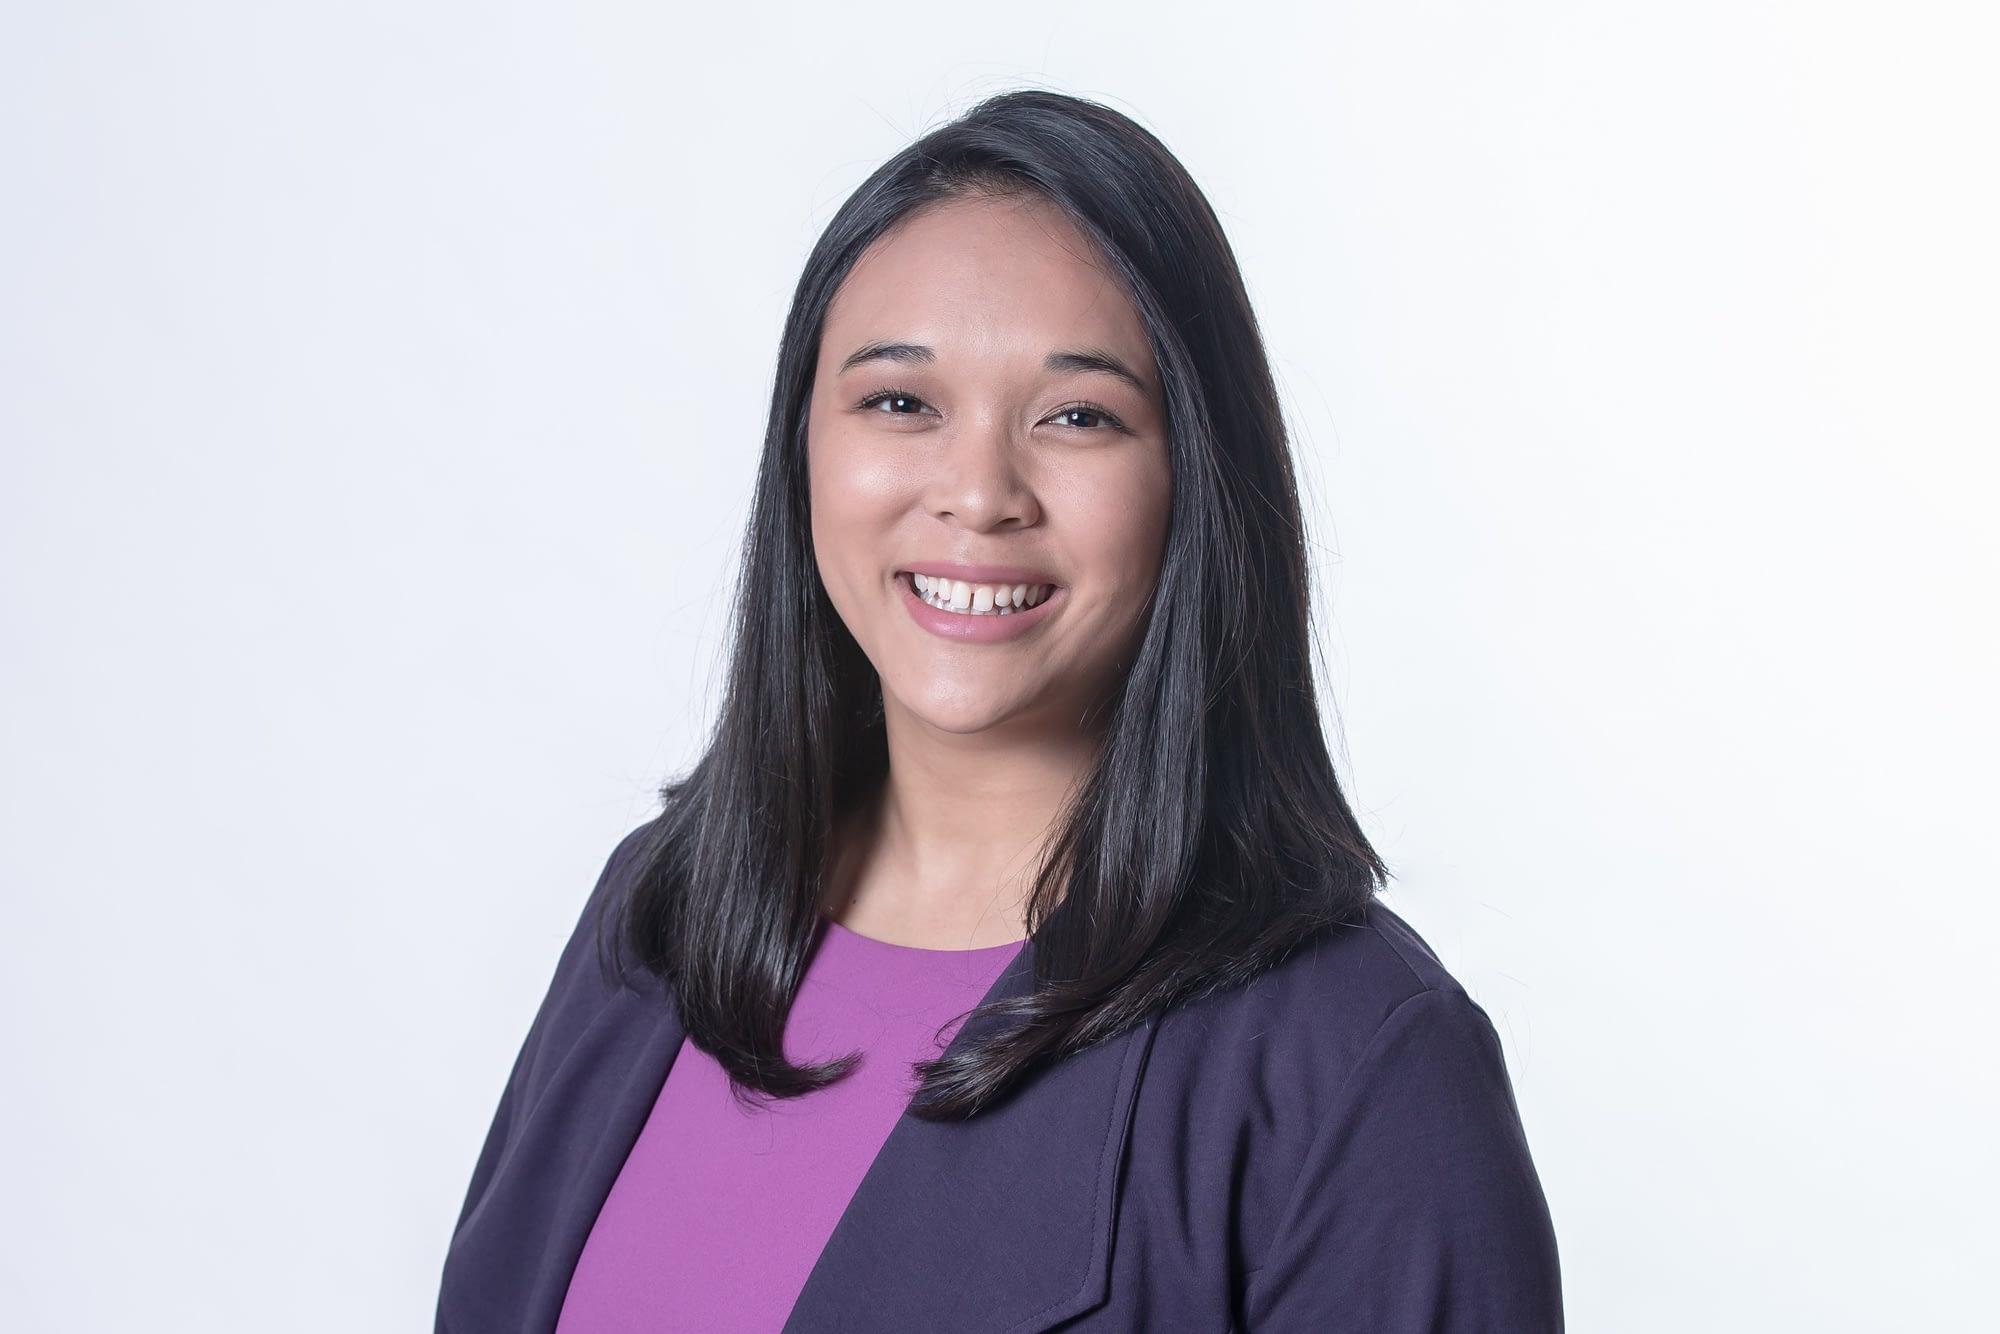 Lianna Xiaokui Nakashima